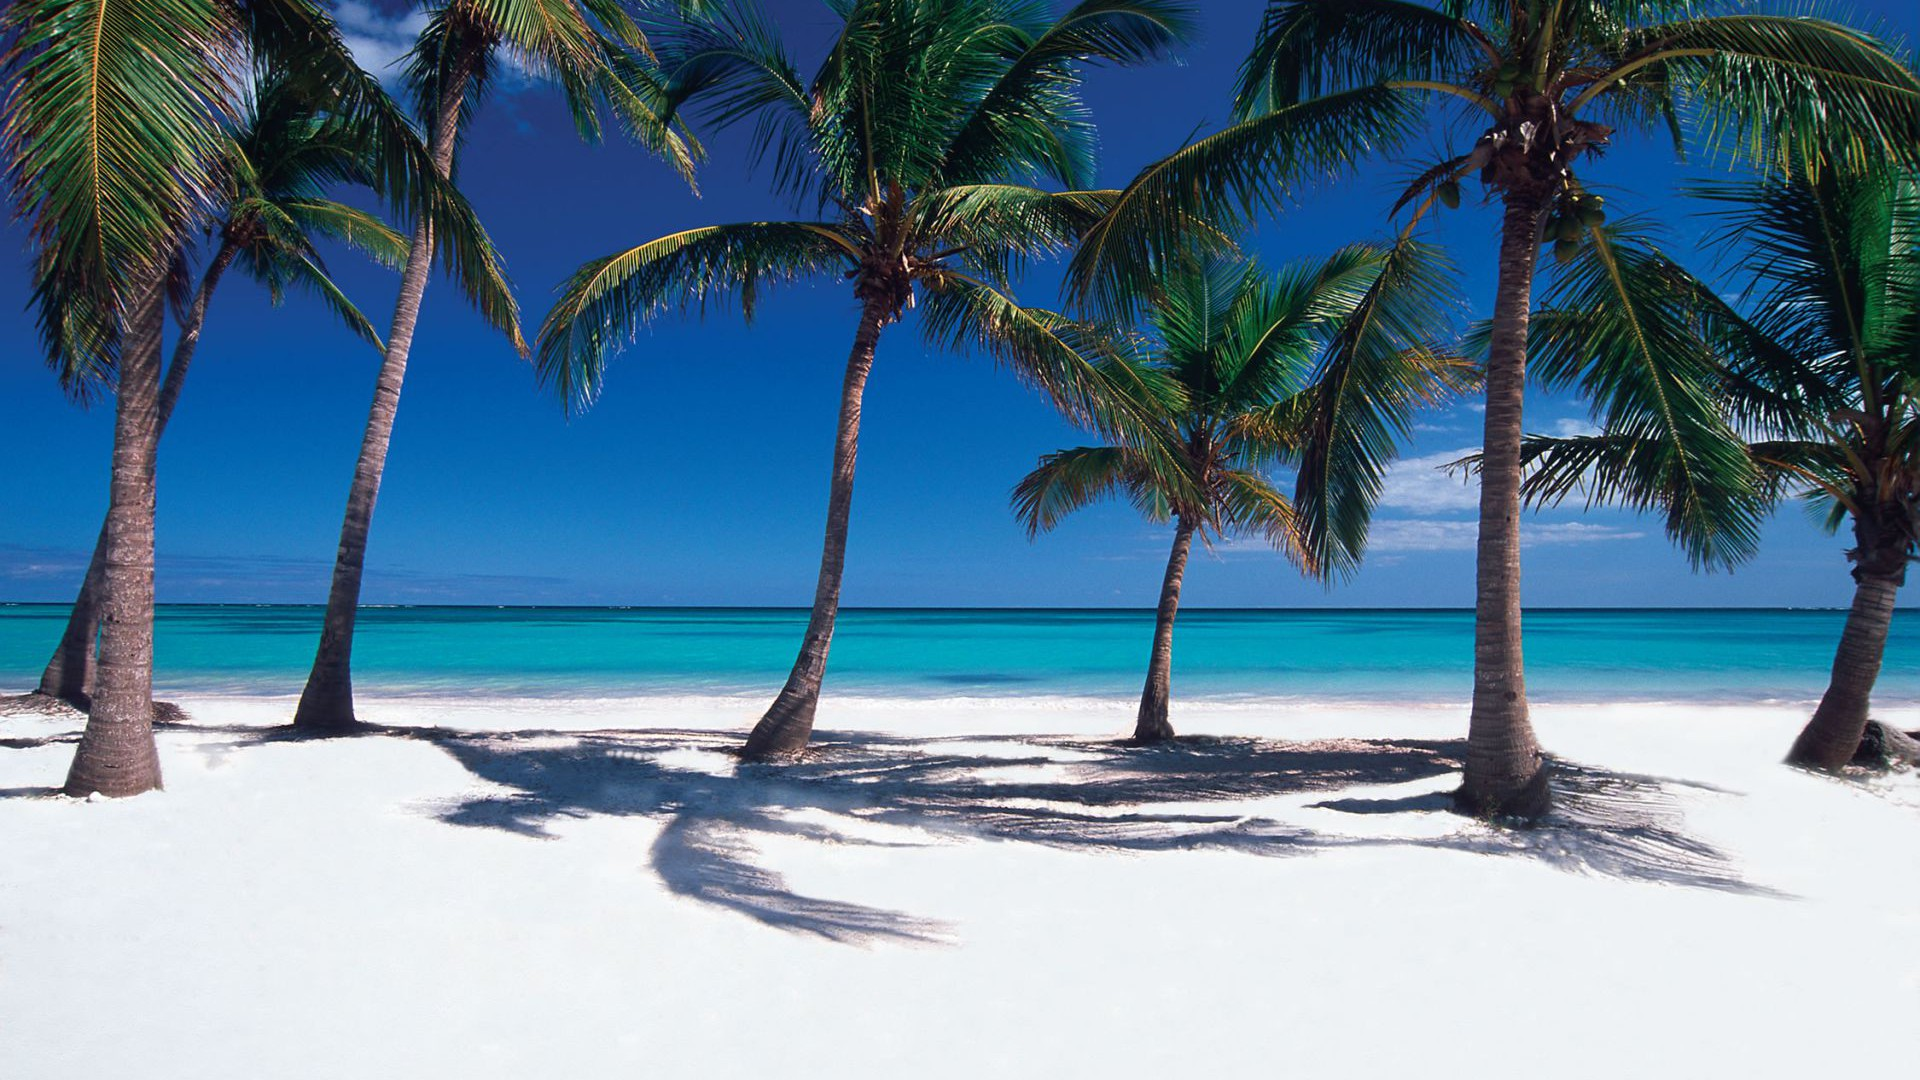 Juanillo Beach Punta Cana beaches